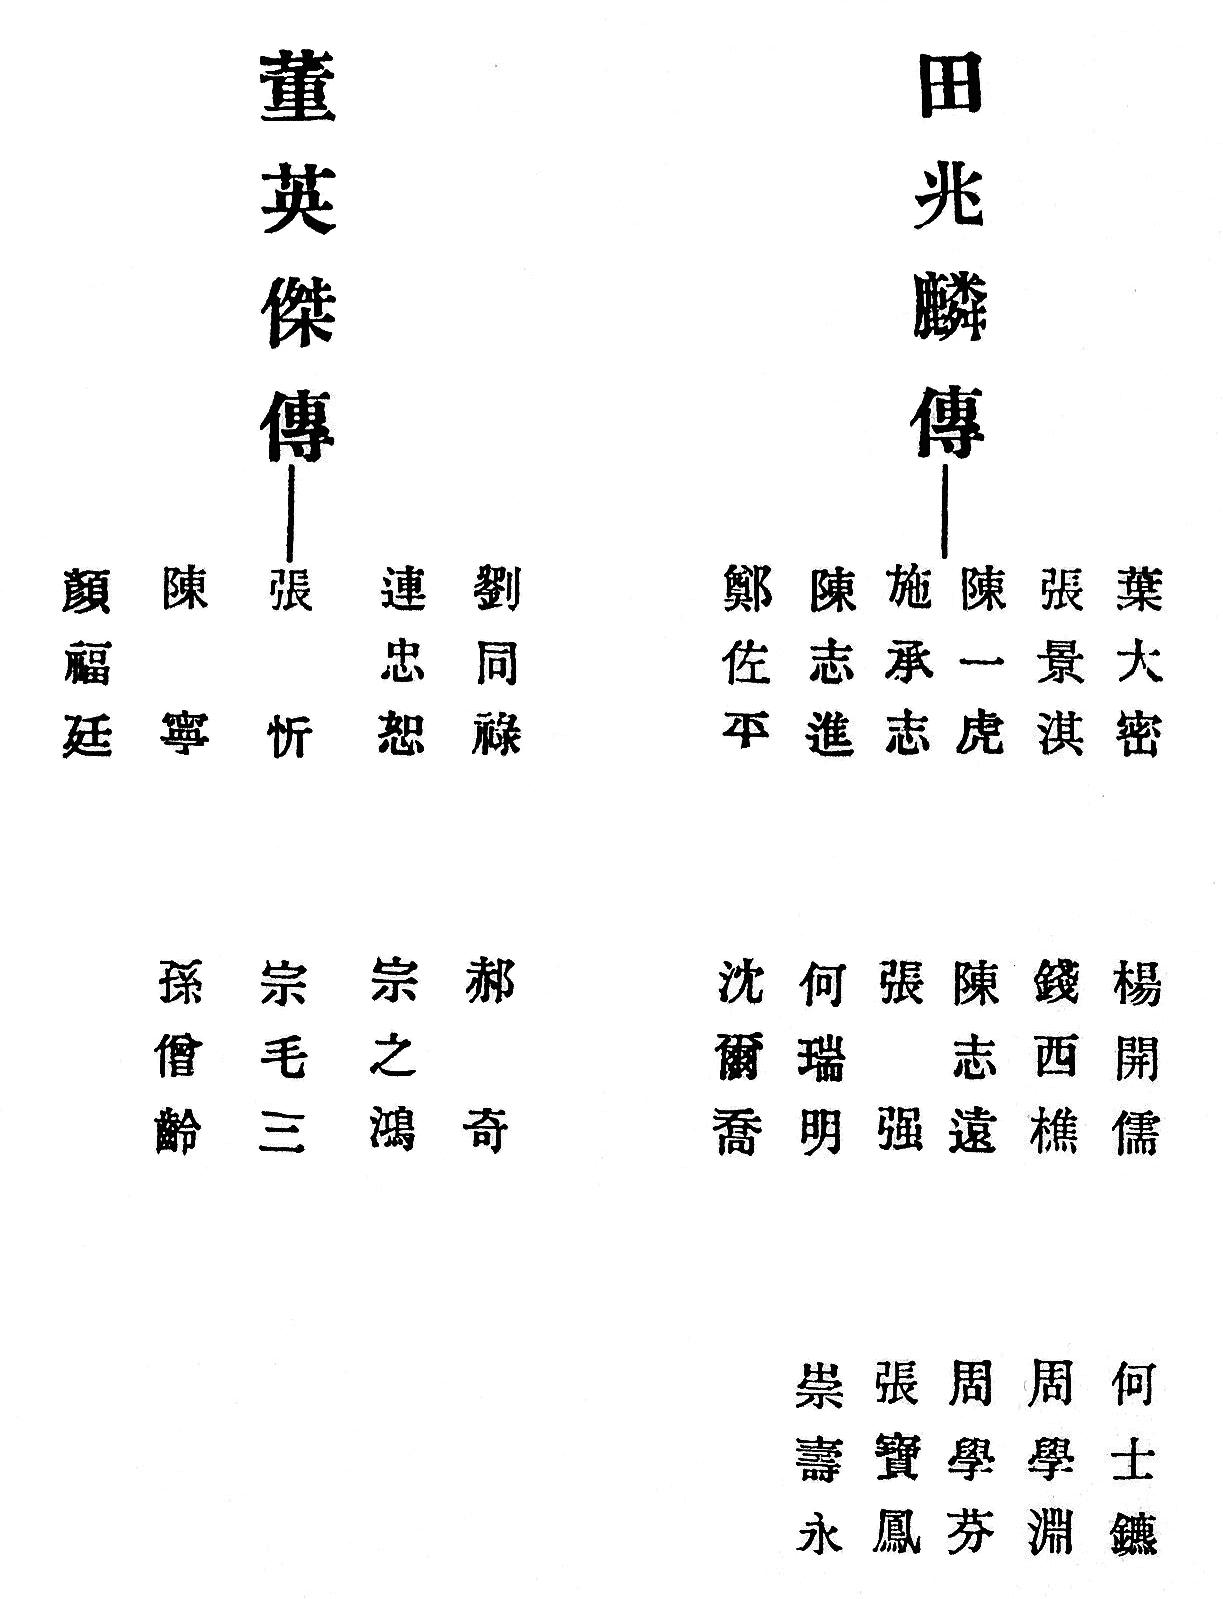 yang-chengfu-bog-lineage-s